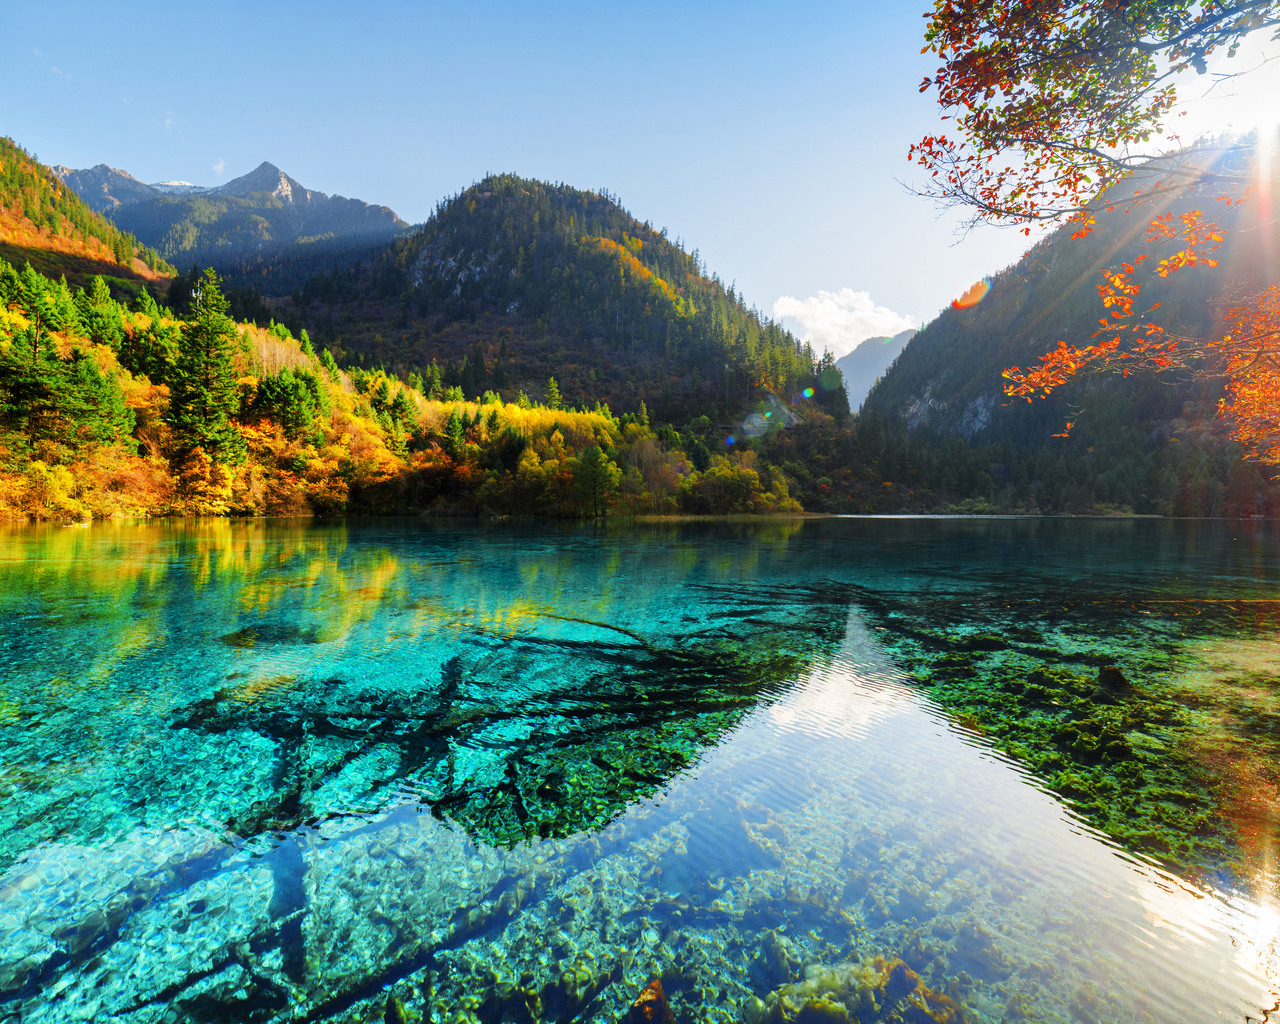 1280x1024 Lake Ultra Hd 4k 1280x1024 Resolution HD 4k